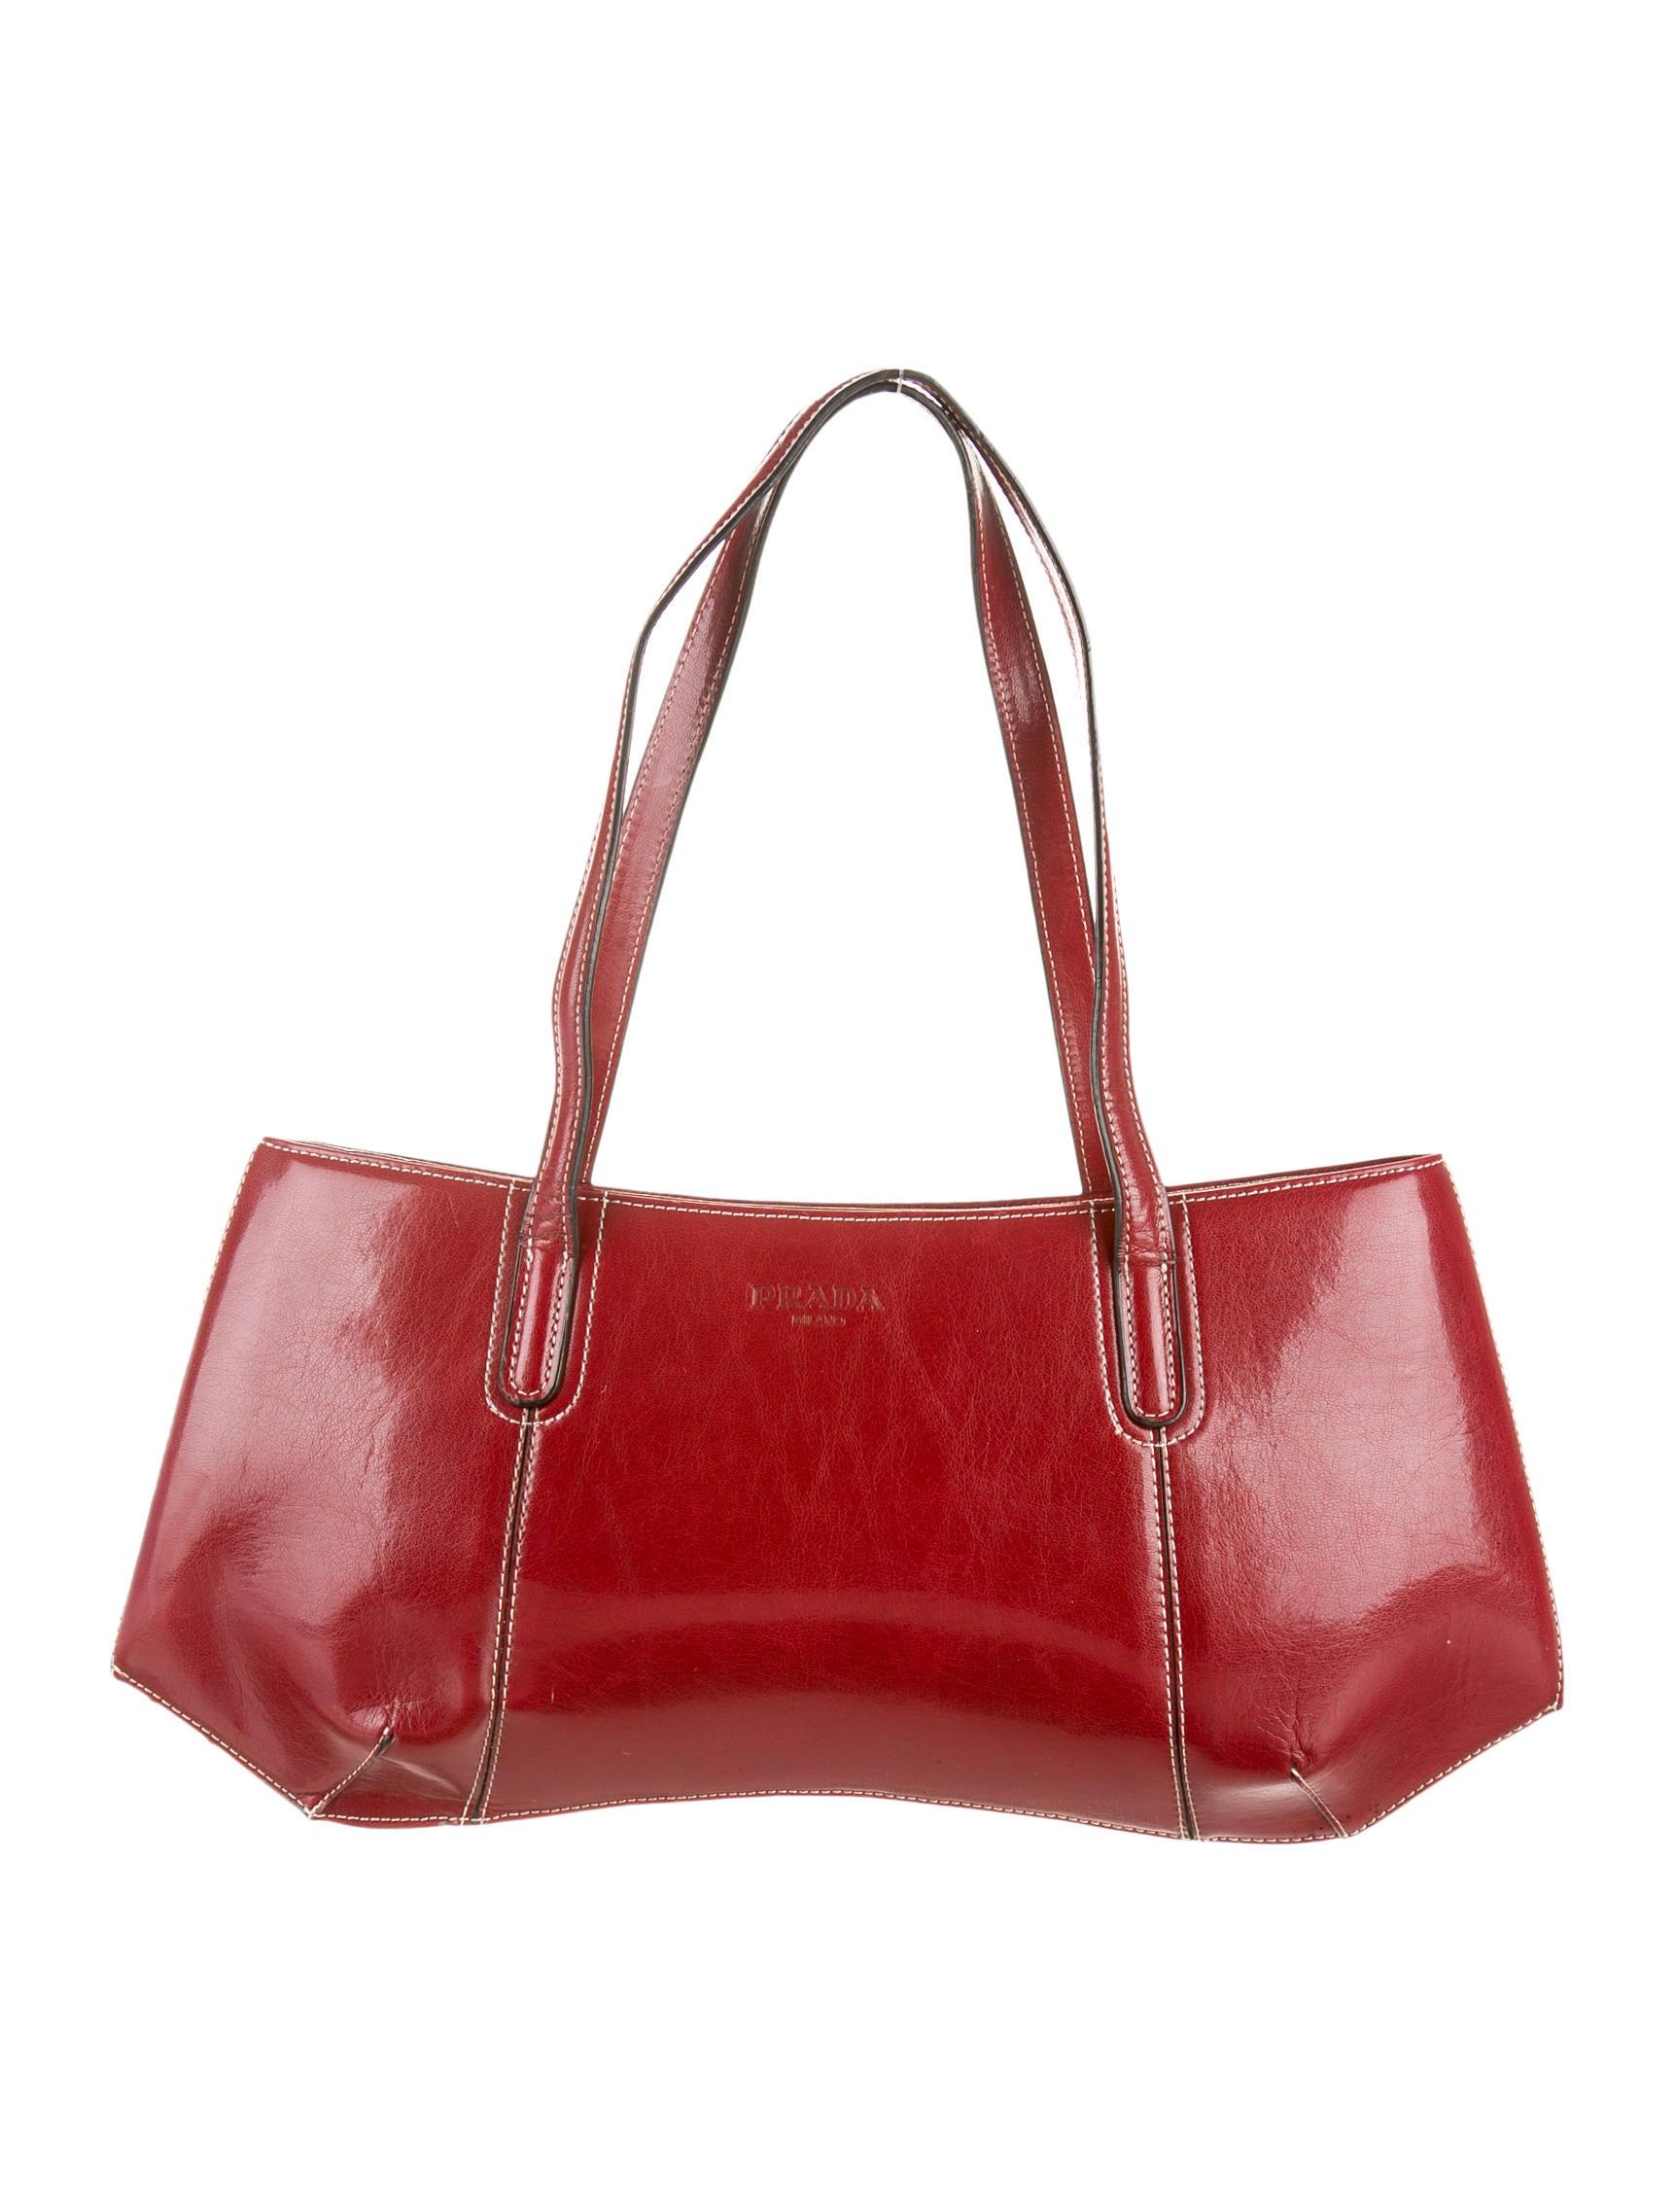 fake prada - prada shoulder bag black + white + red